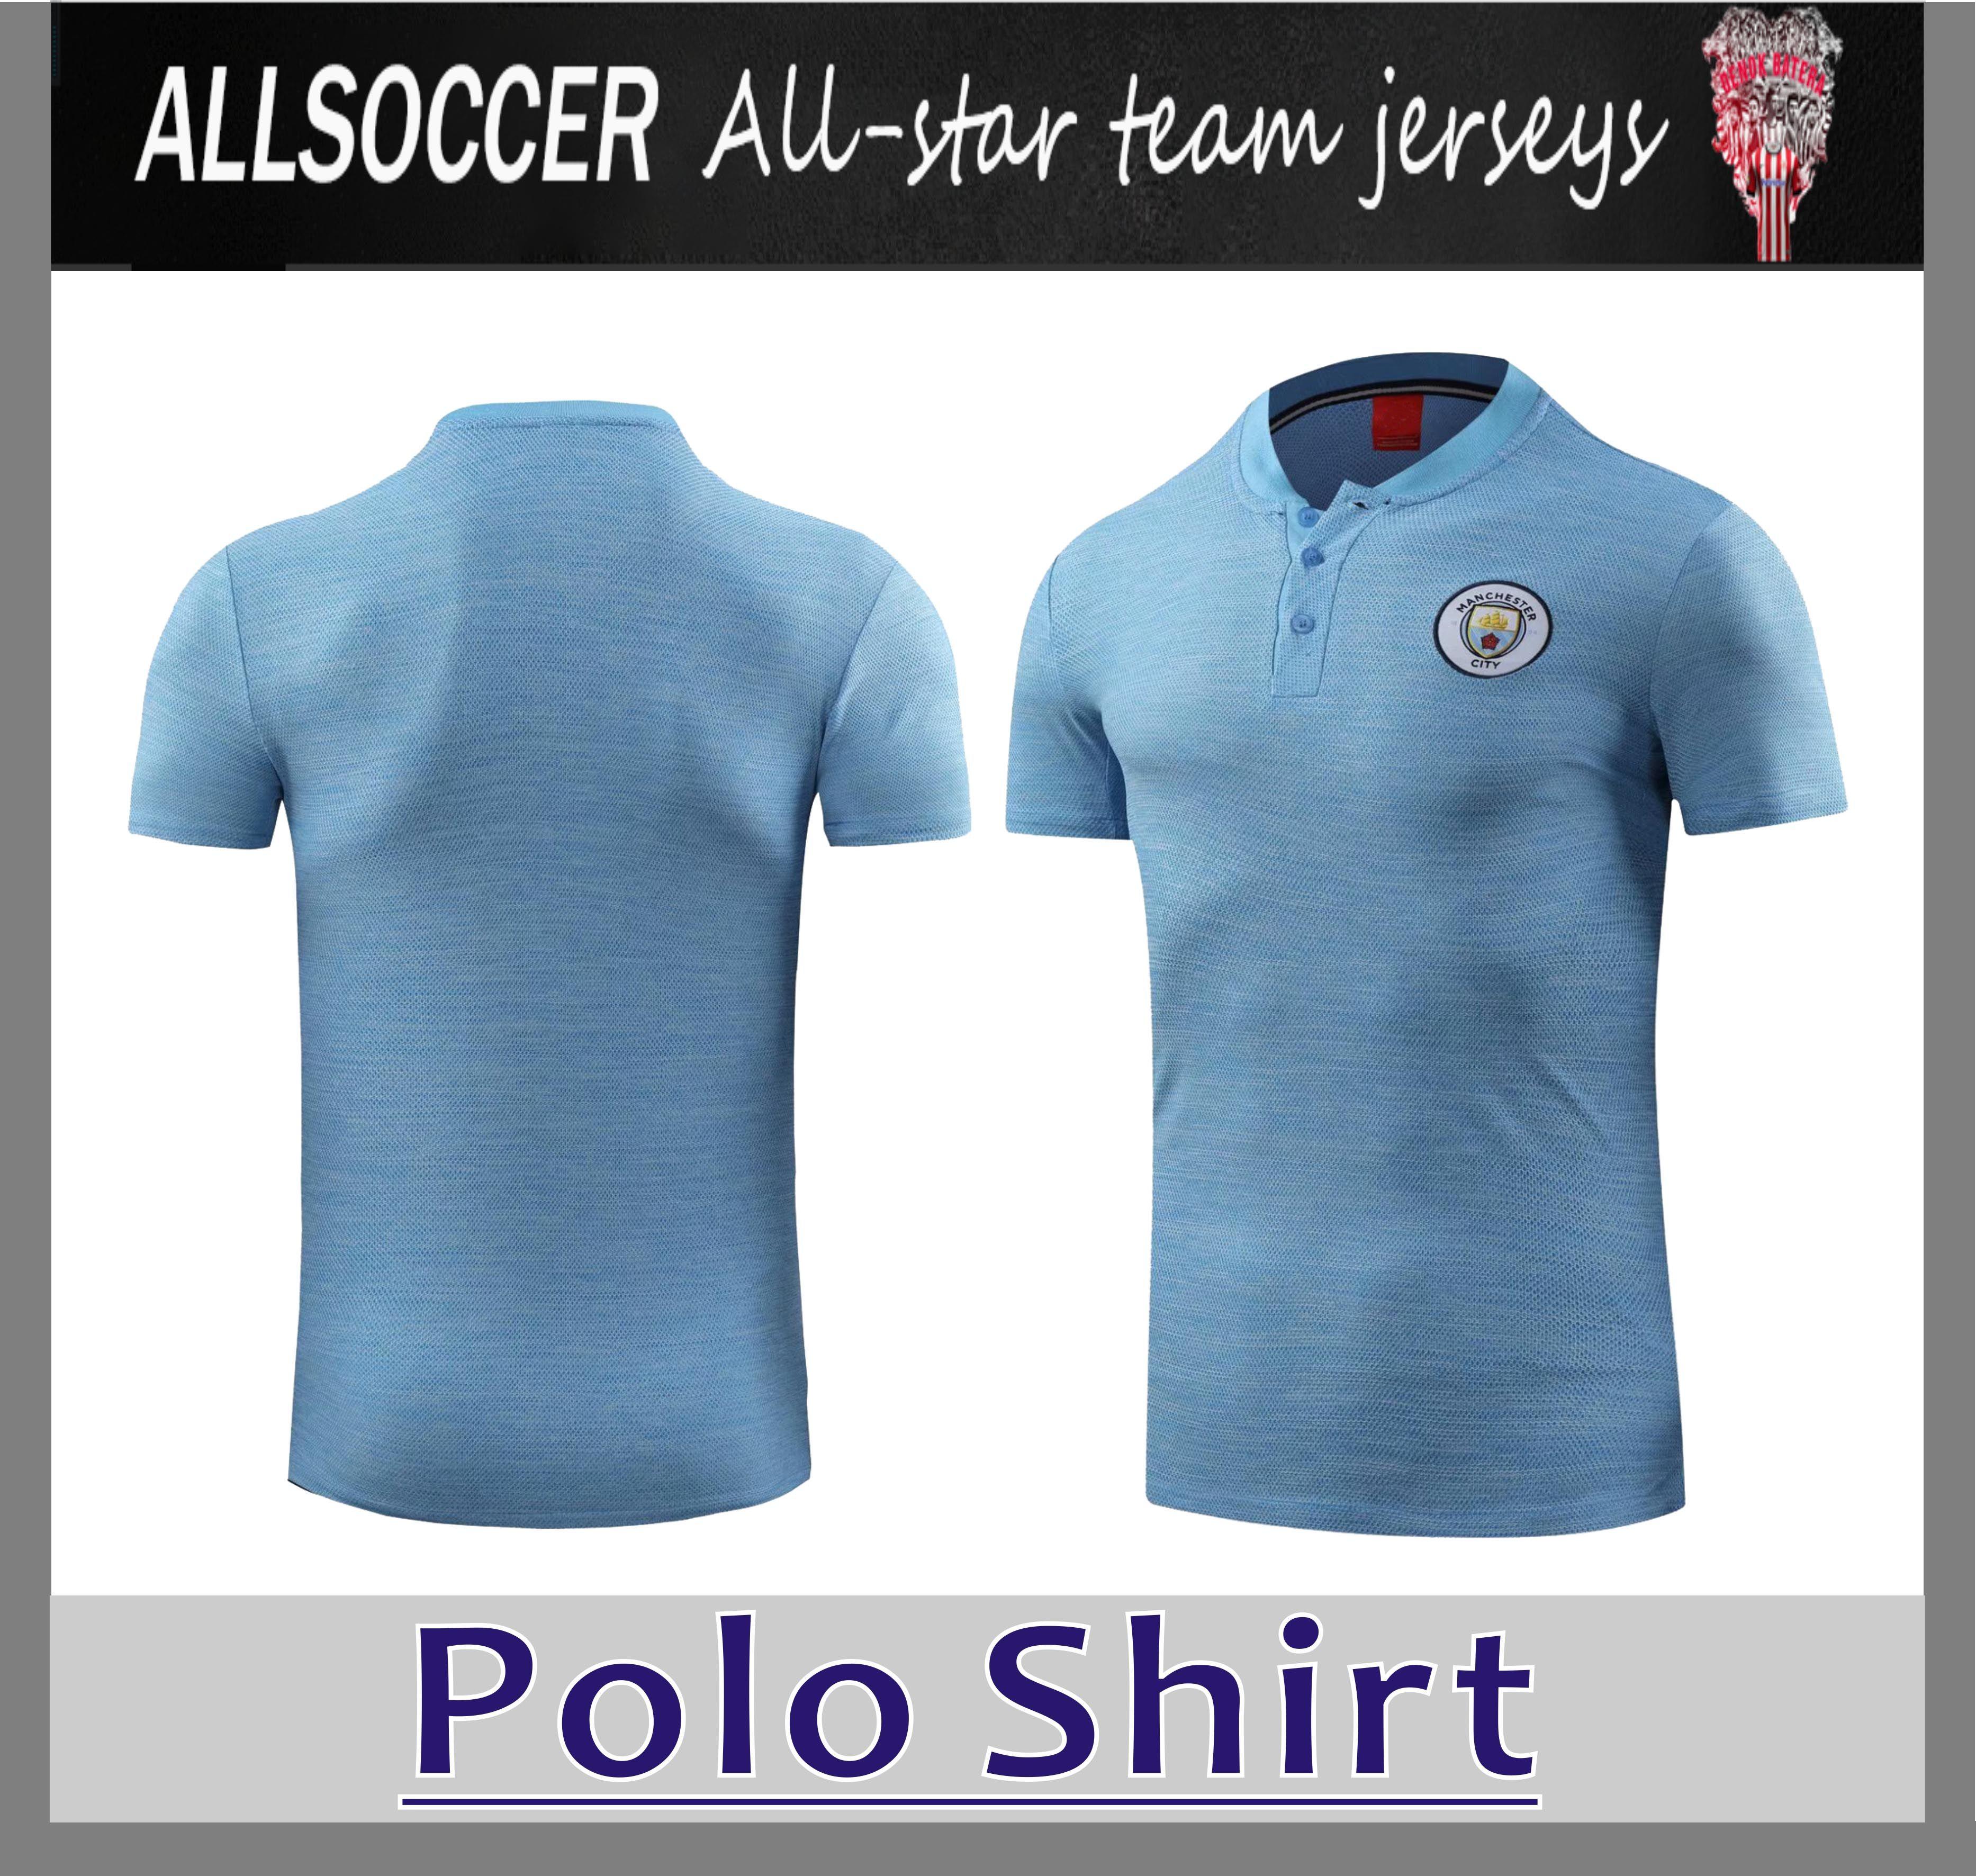 fc7d49c6 2019 2019 MAN CITY Blue Polo Shirt 18/19 KUNAGUERO DE BRUYNE Soccer Polo  Football Uniforms Sport Shirt On SaleAthletic From Allsoccer, $18.28 |  DHgate.Com